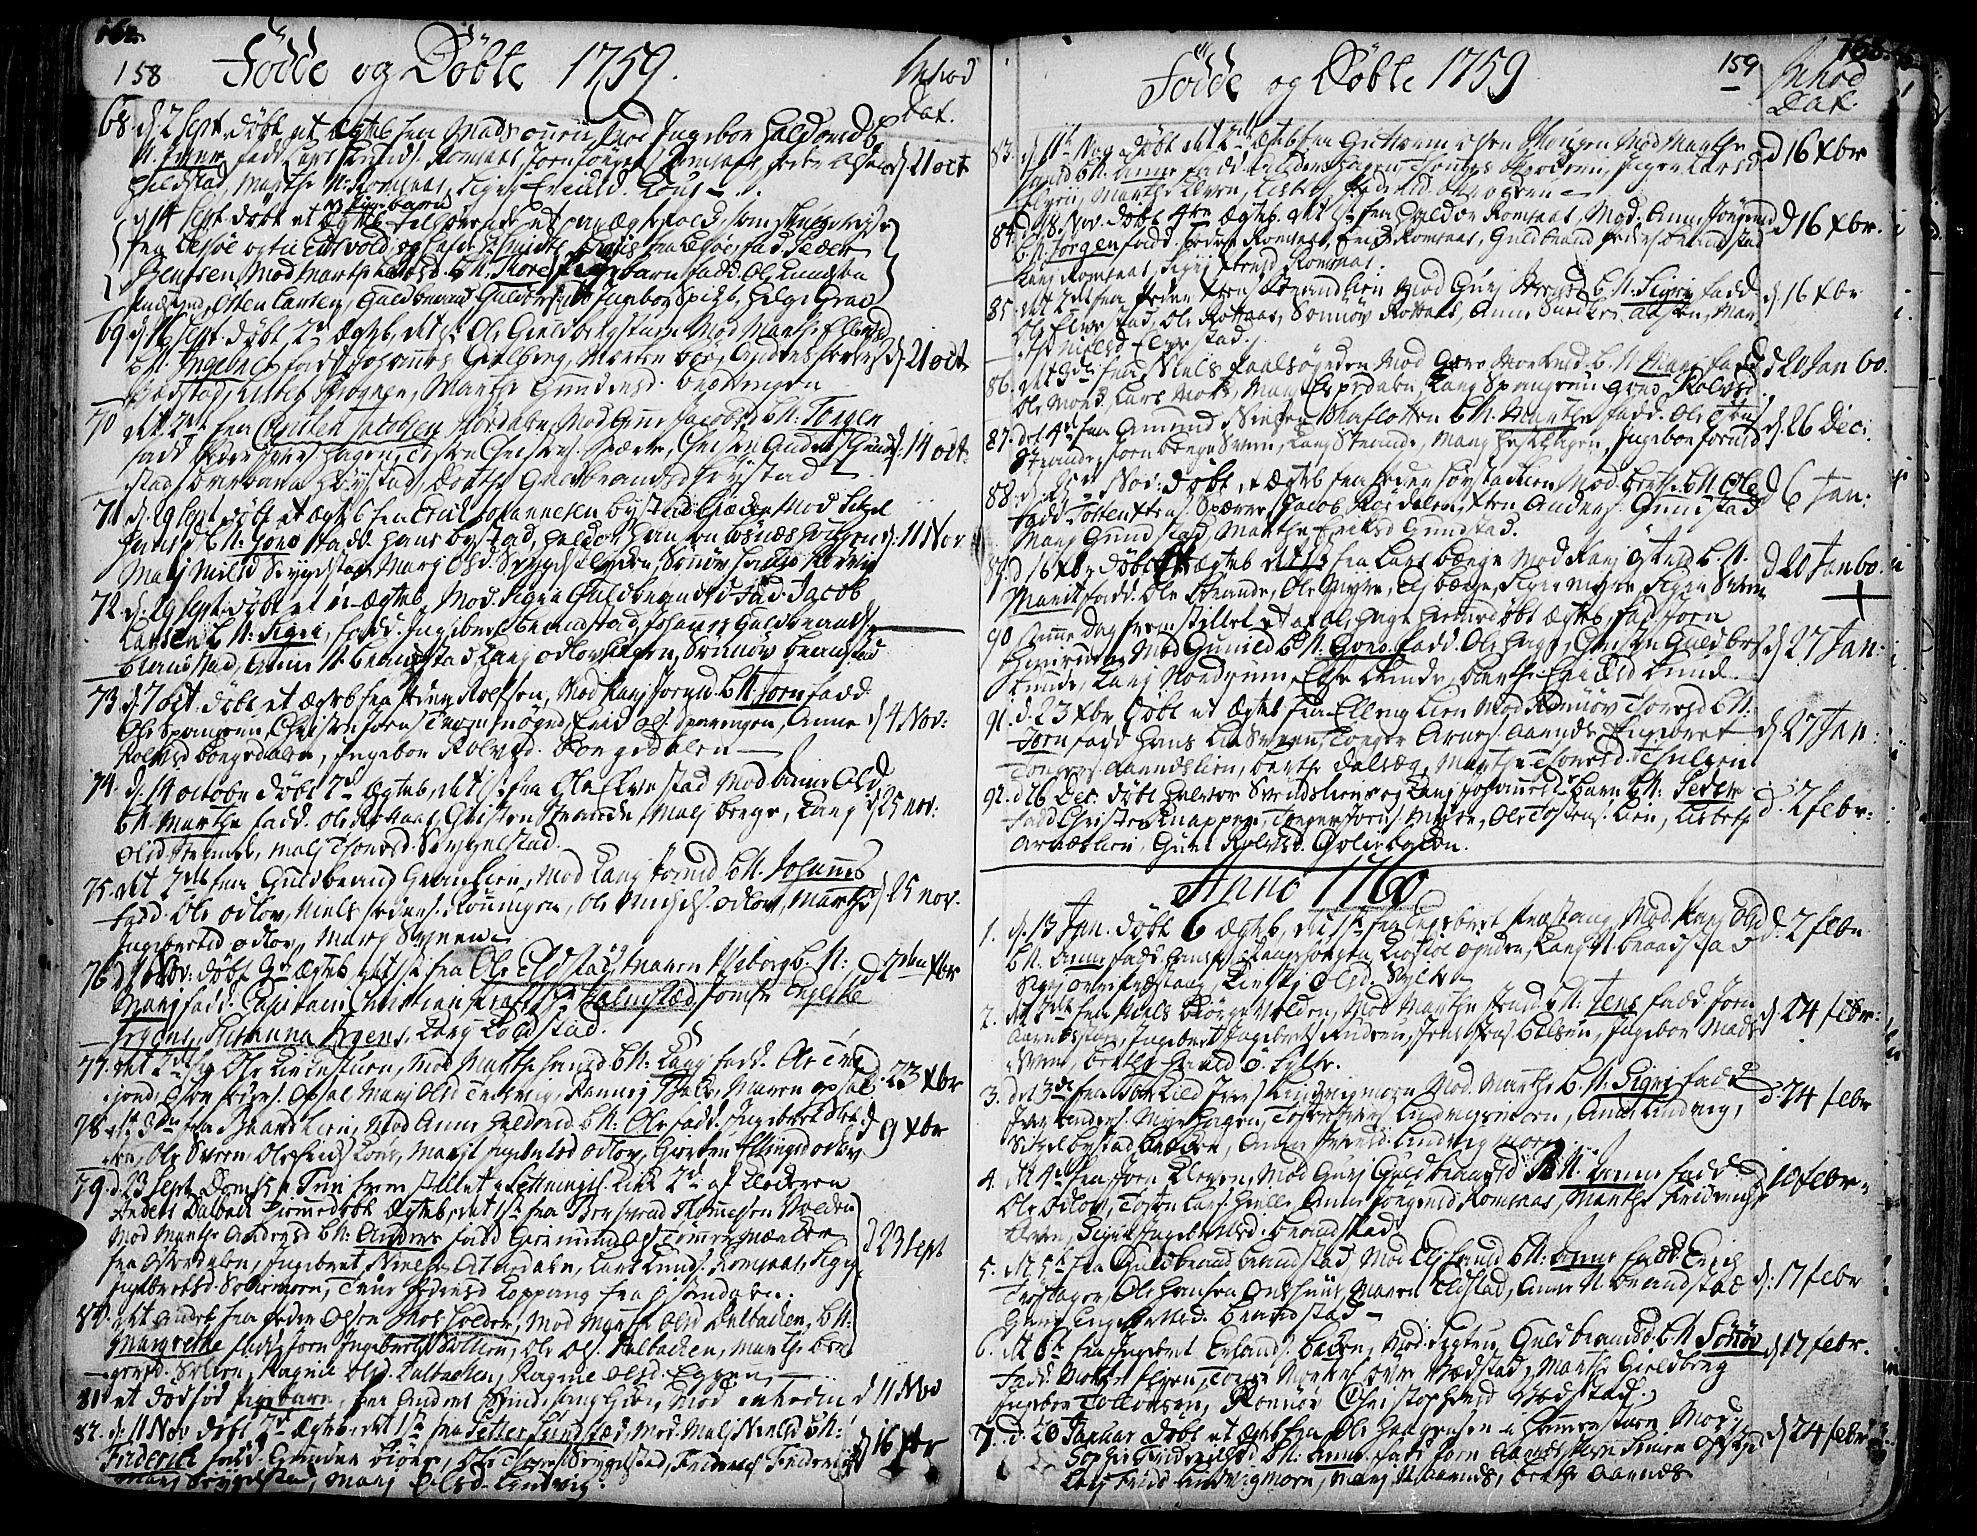 SAH, Ringebu prestekontor, Ministerialbok nr. 2, 1734-1780, s. 158-159